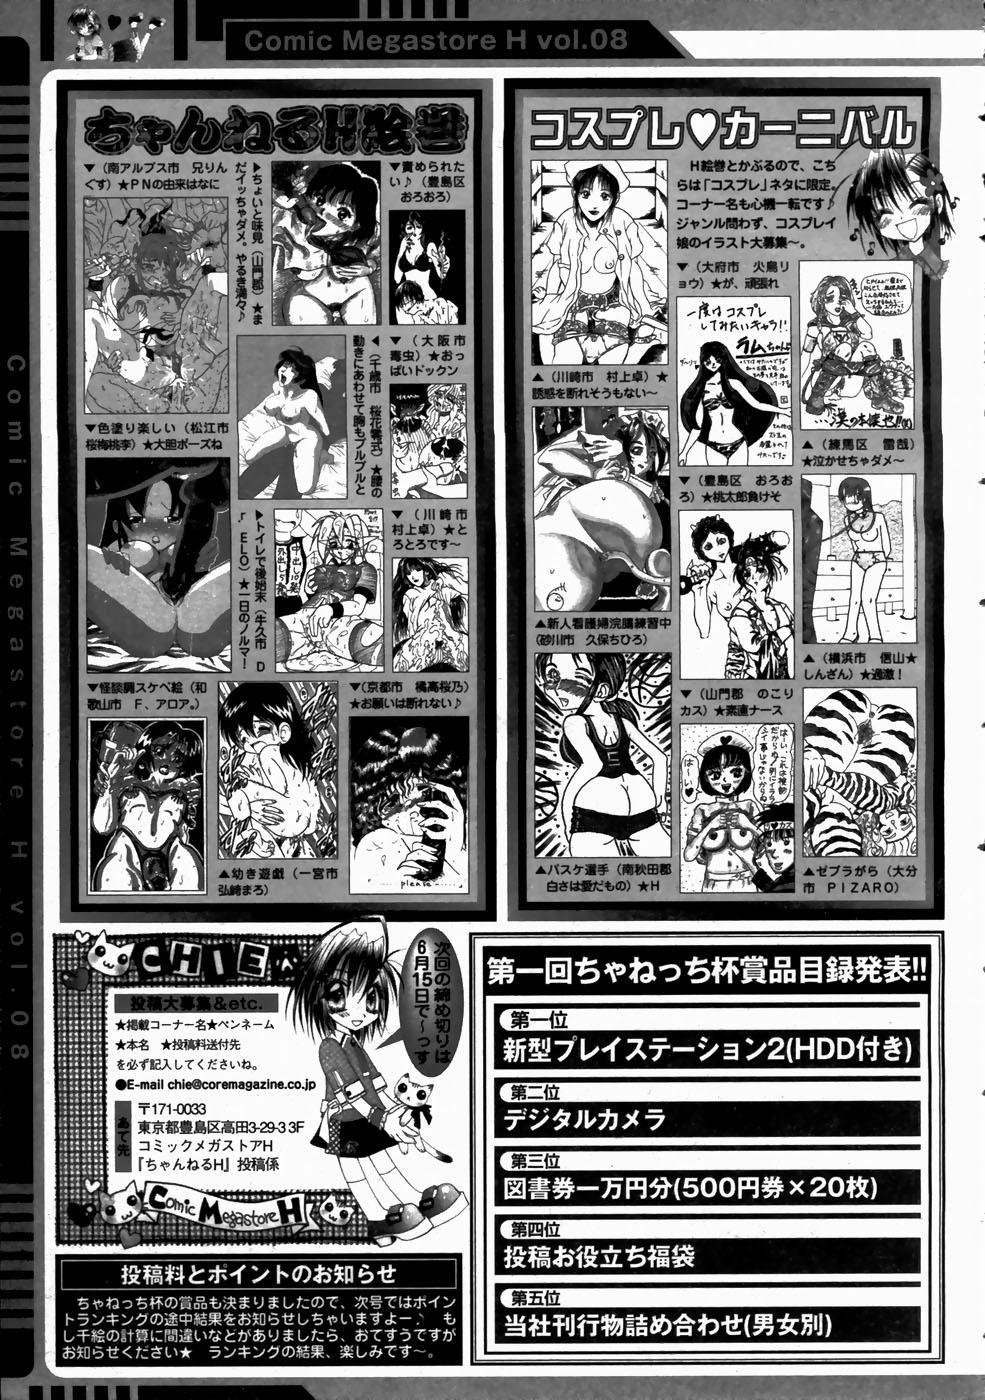 COMIC Megastore H 2003-07 272